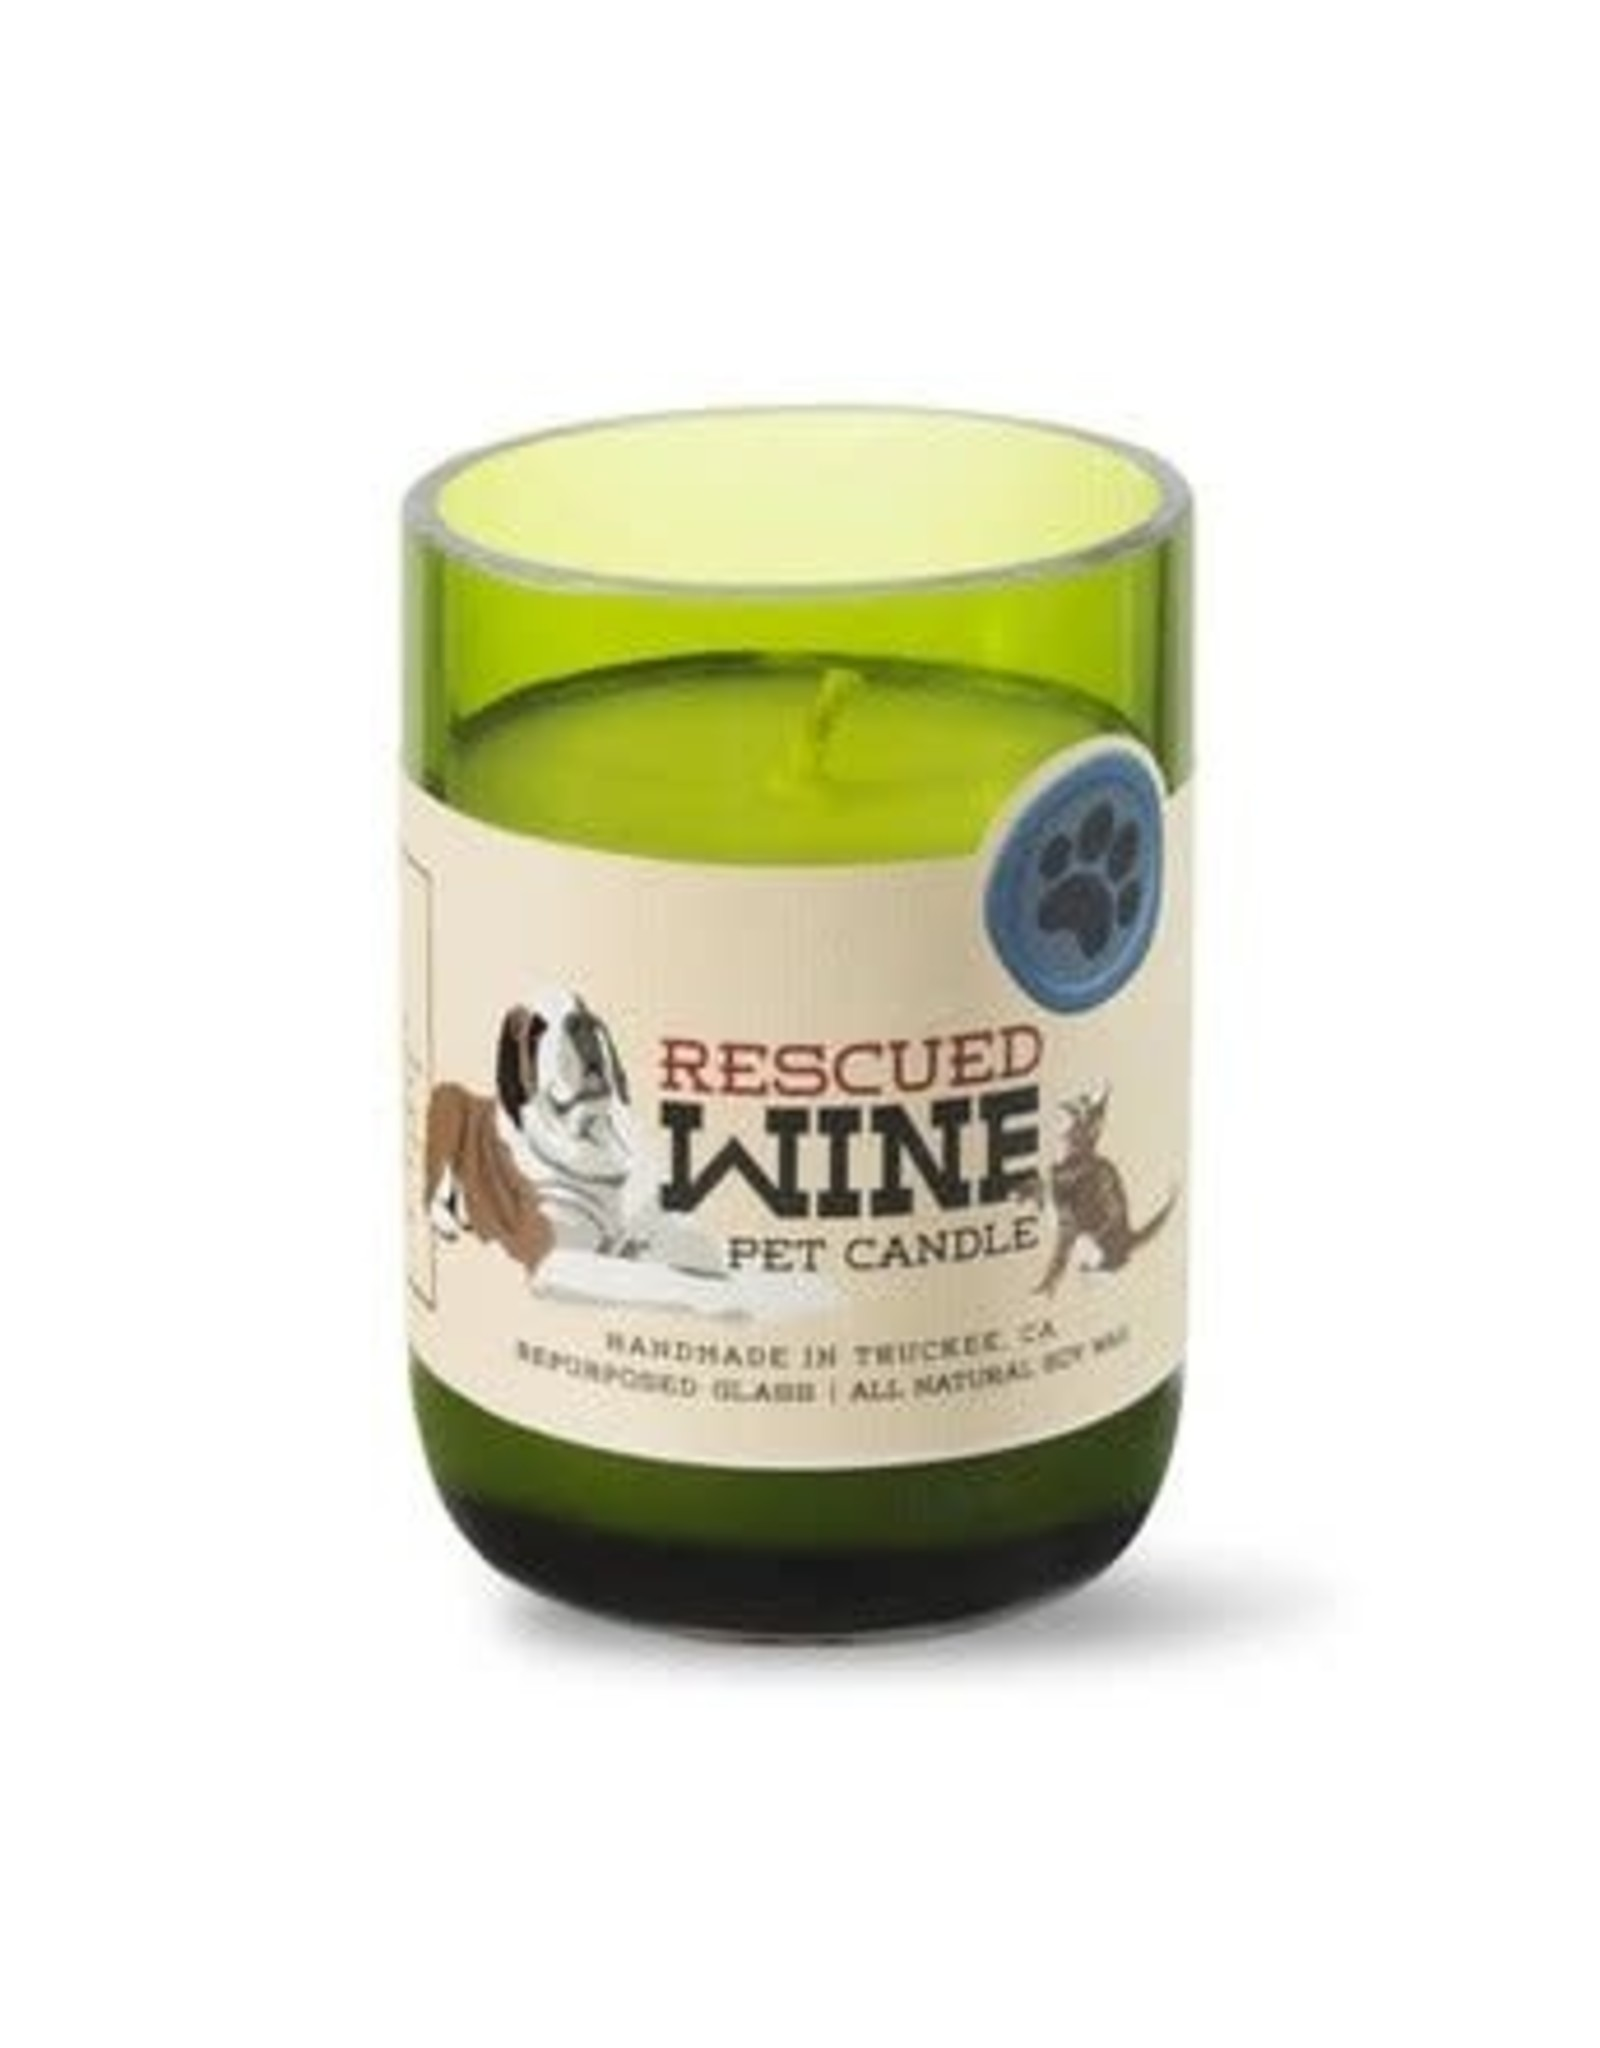 Fresh Linen, Pet Candle, 12 oz, USA